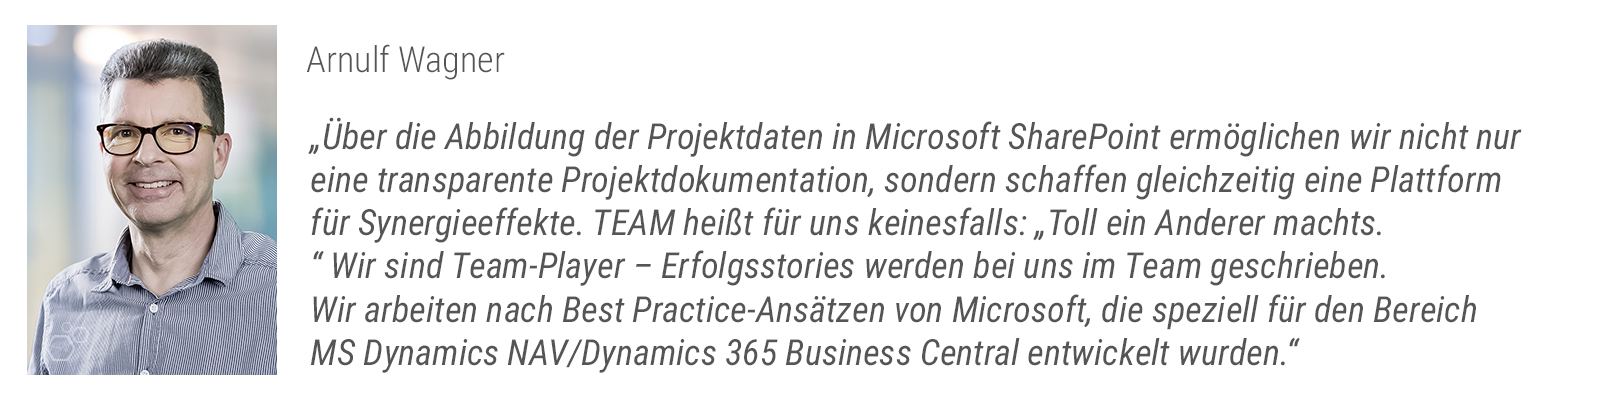 Projektmanagement - Arnulf Wagner